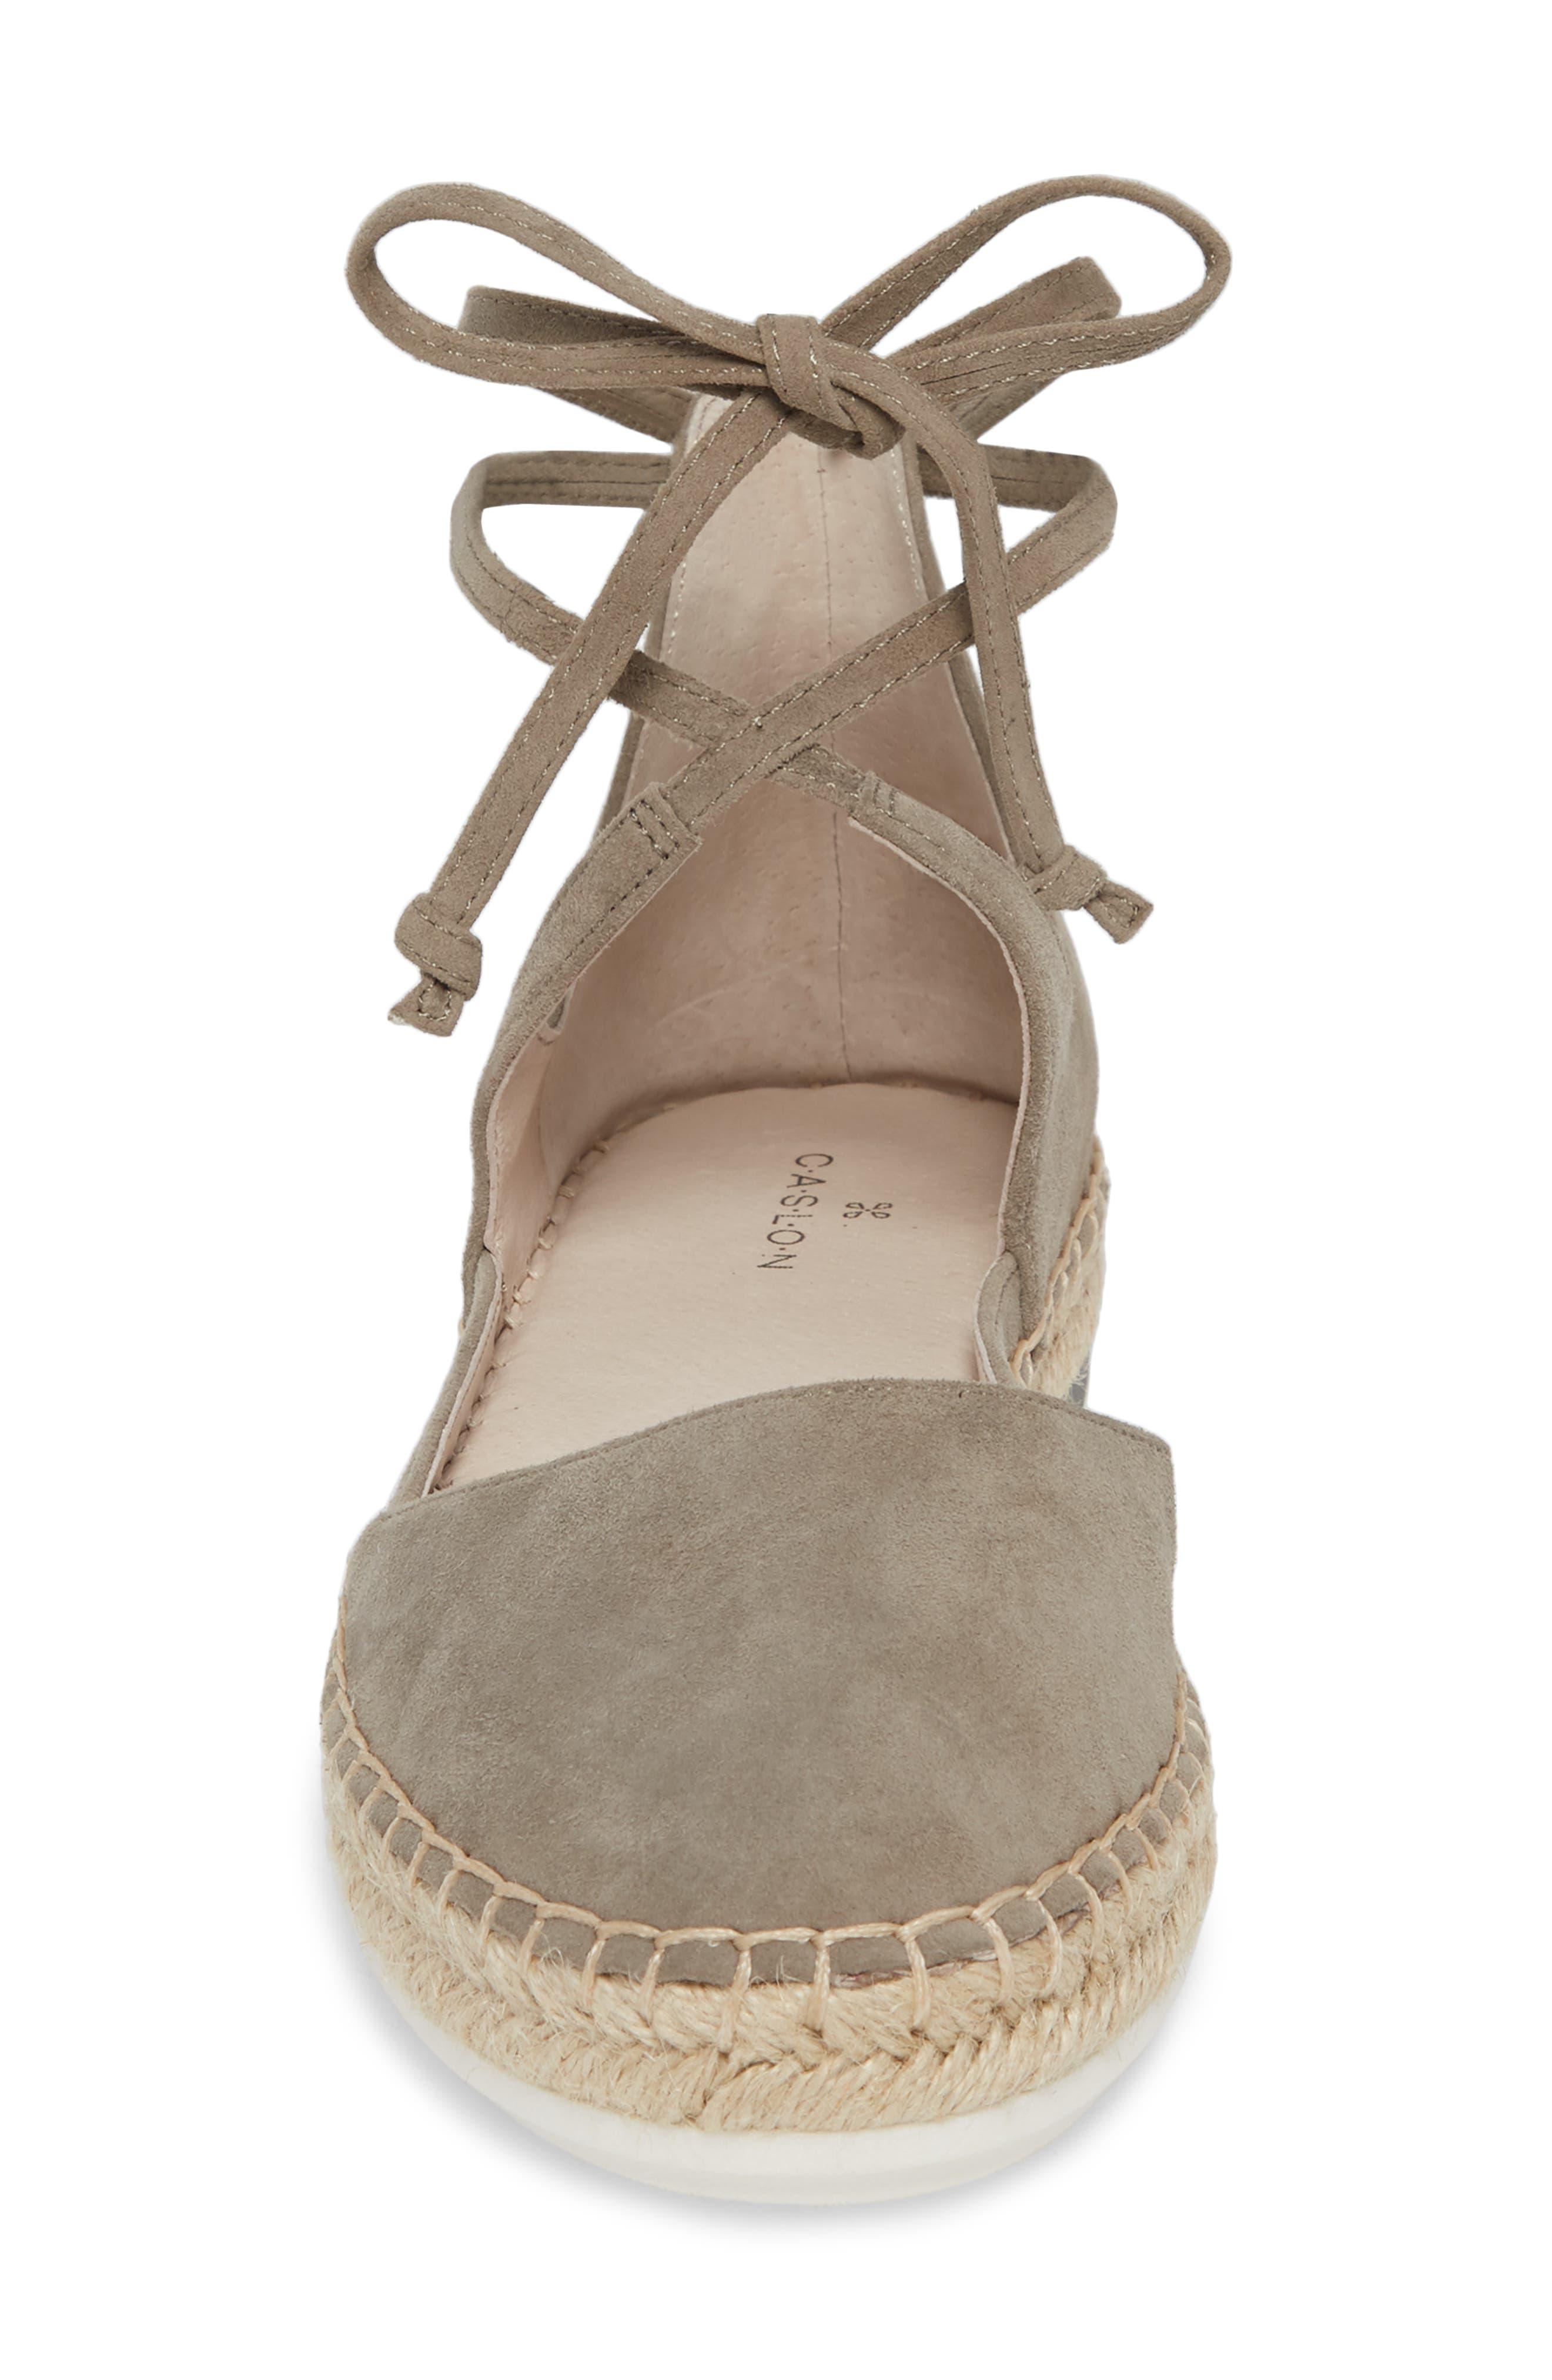 Leena Ankle Strap Sandal,                             Alternate thumbnail 4, color,                             Grey Suede